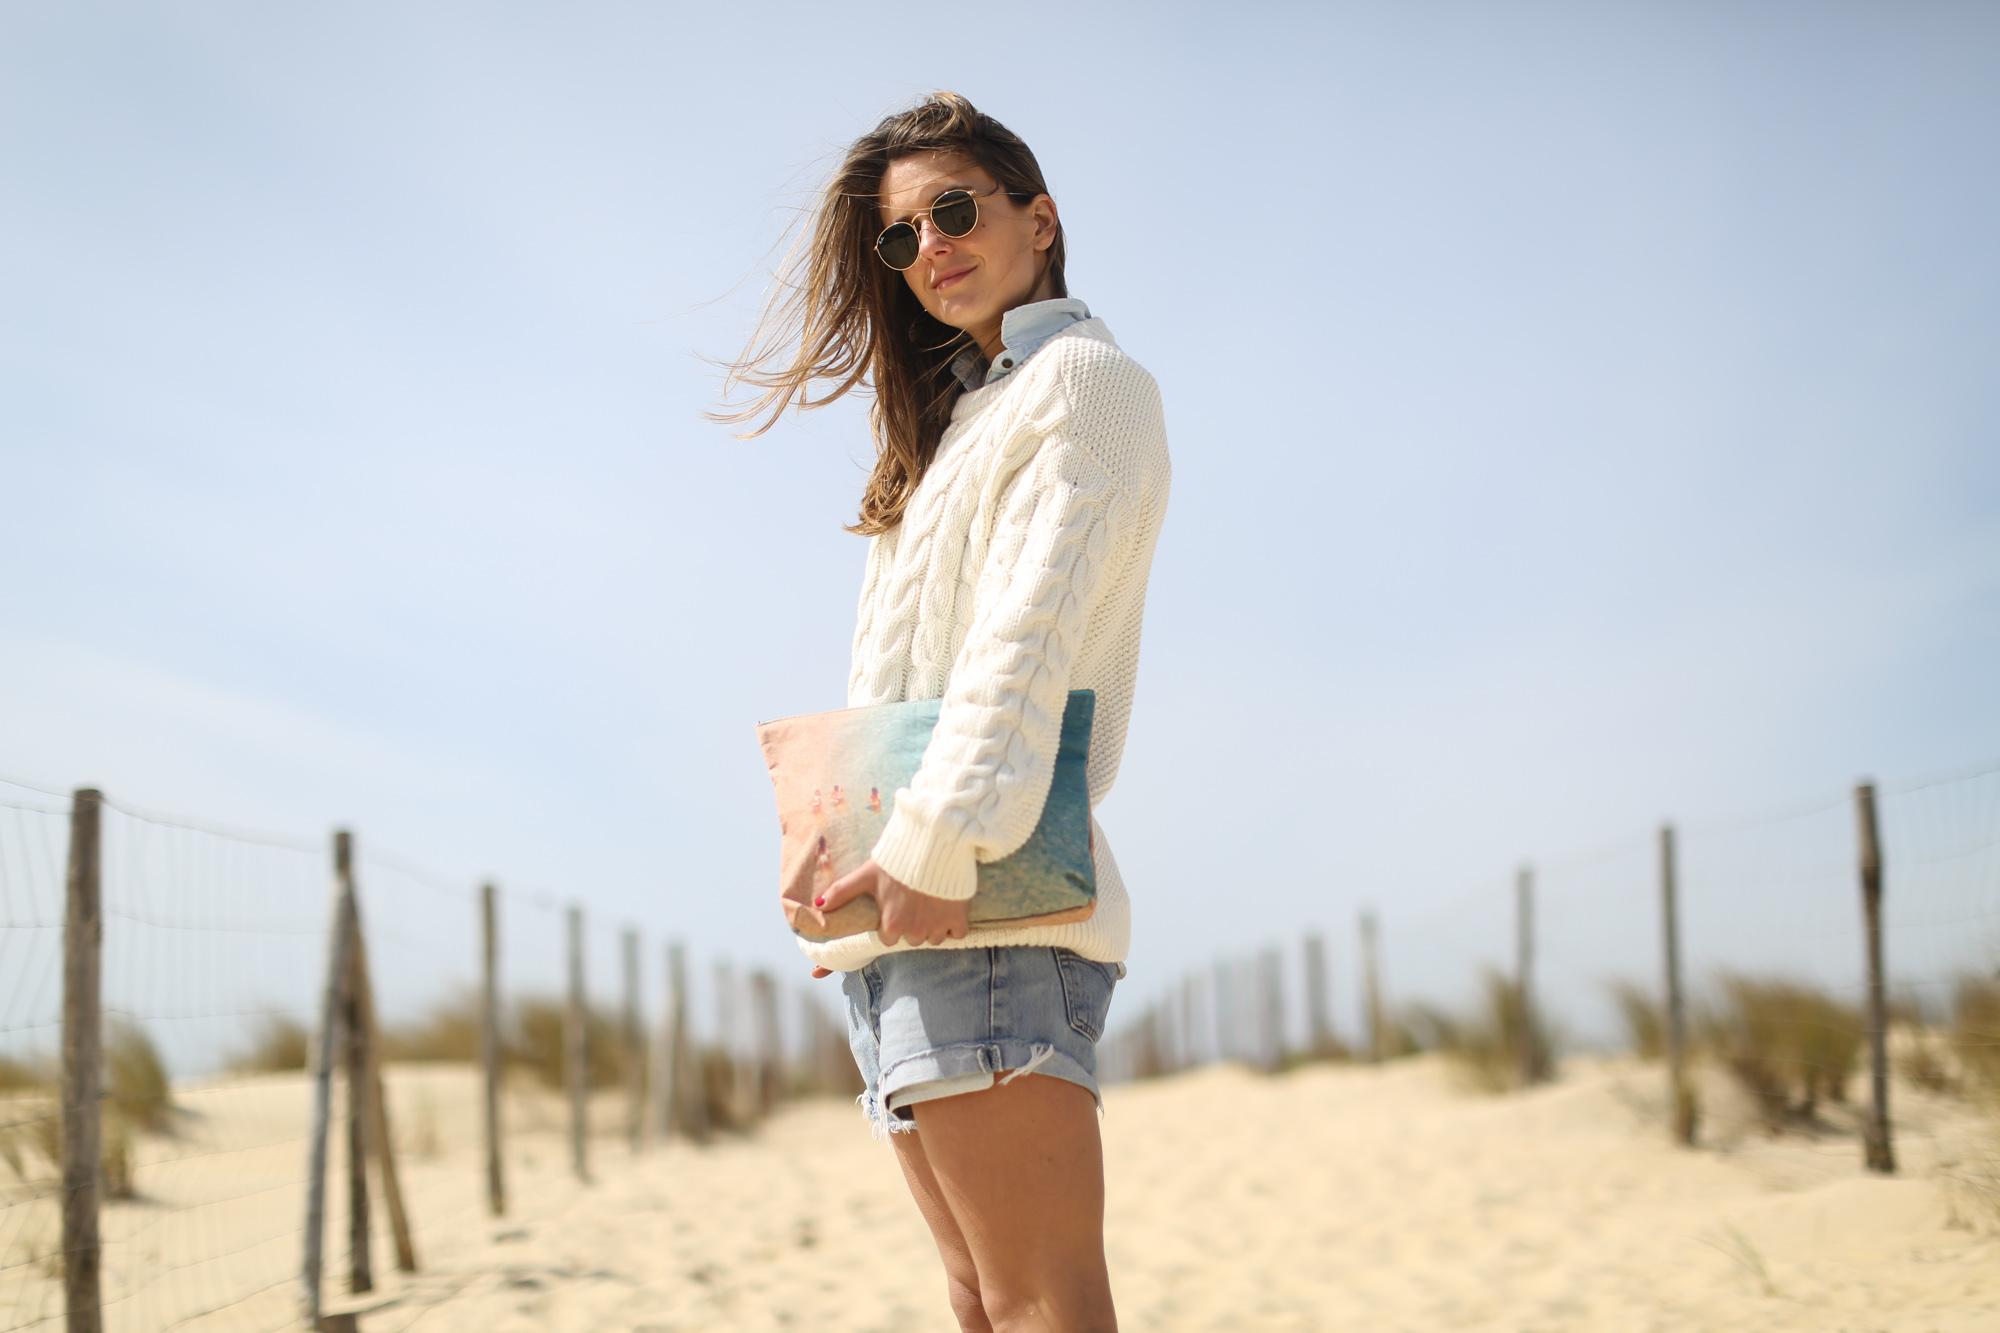 Clochet-streetstyle-levis-501-vintage-shorts-superga-crochet-thalatta-concept-bathers-pouch-3